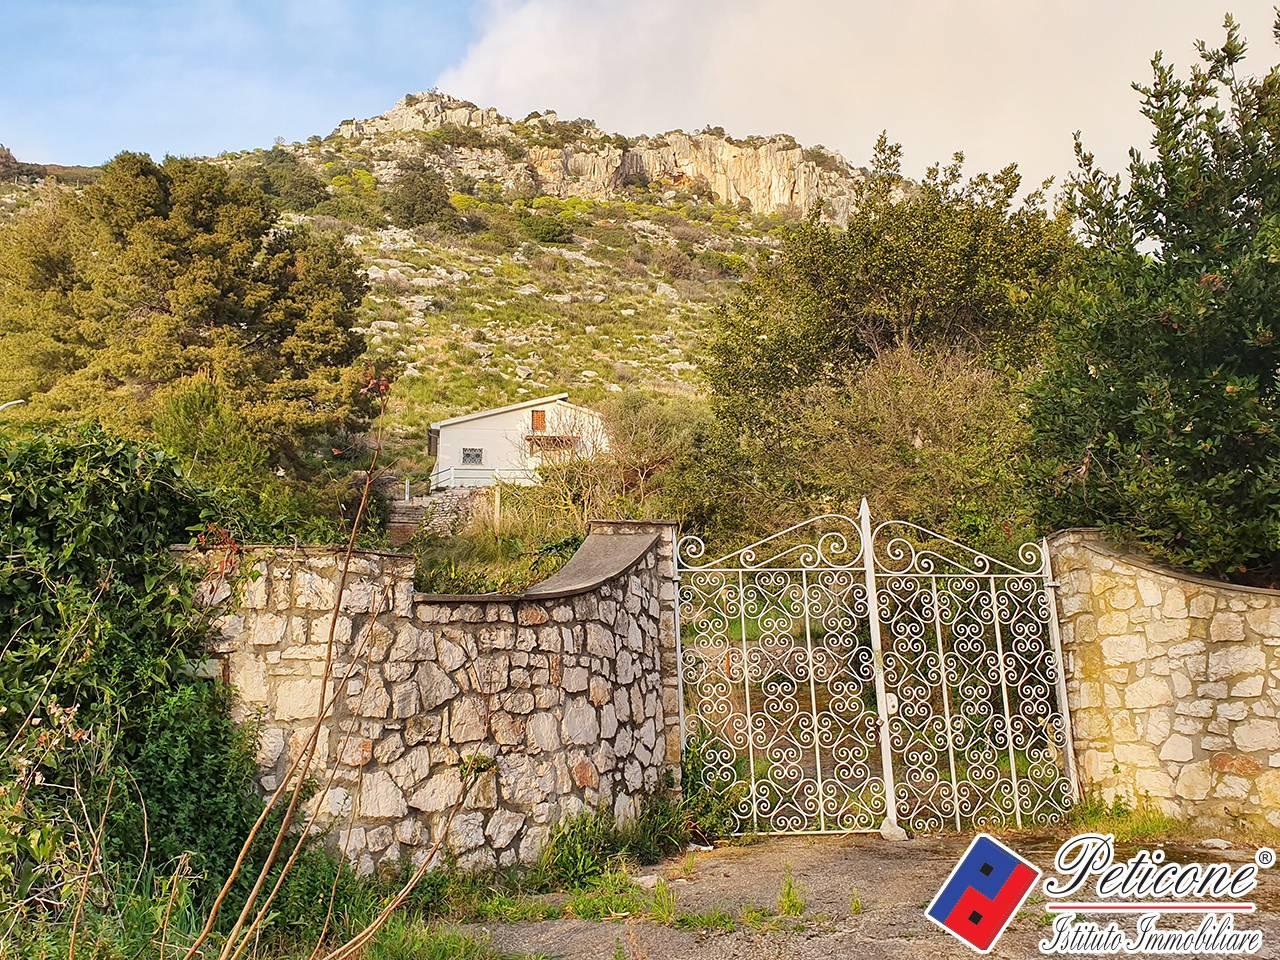 Villa in Vendita a Sperlonga: 3 locali, 50 mq - Foto 6